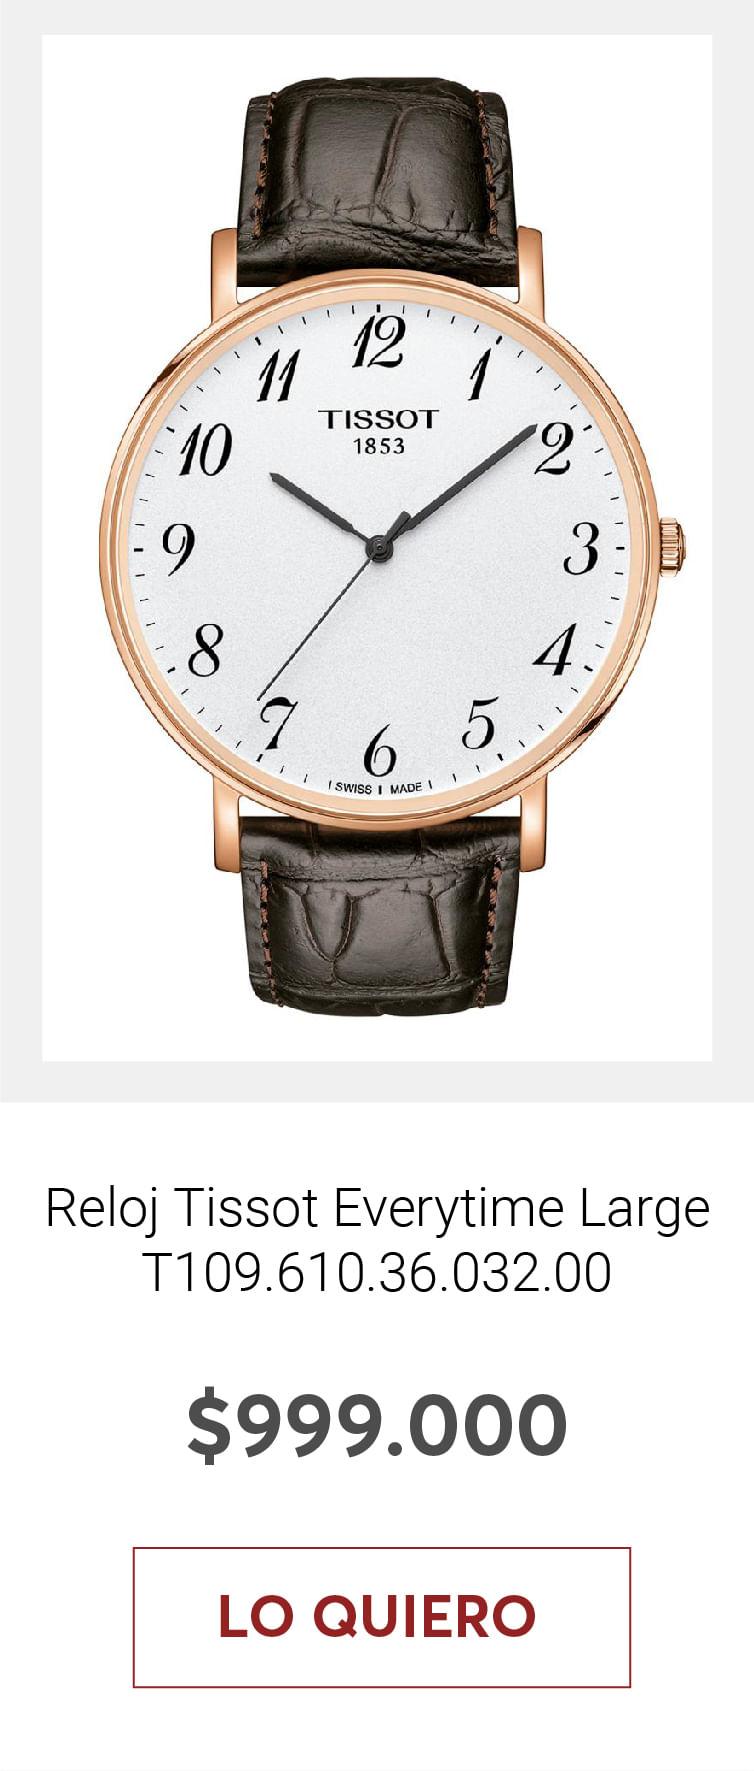 Reloj Tissot Everytime Large T109.610.36.032.00